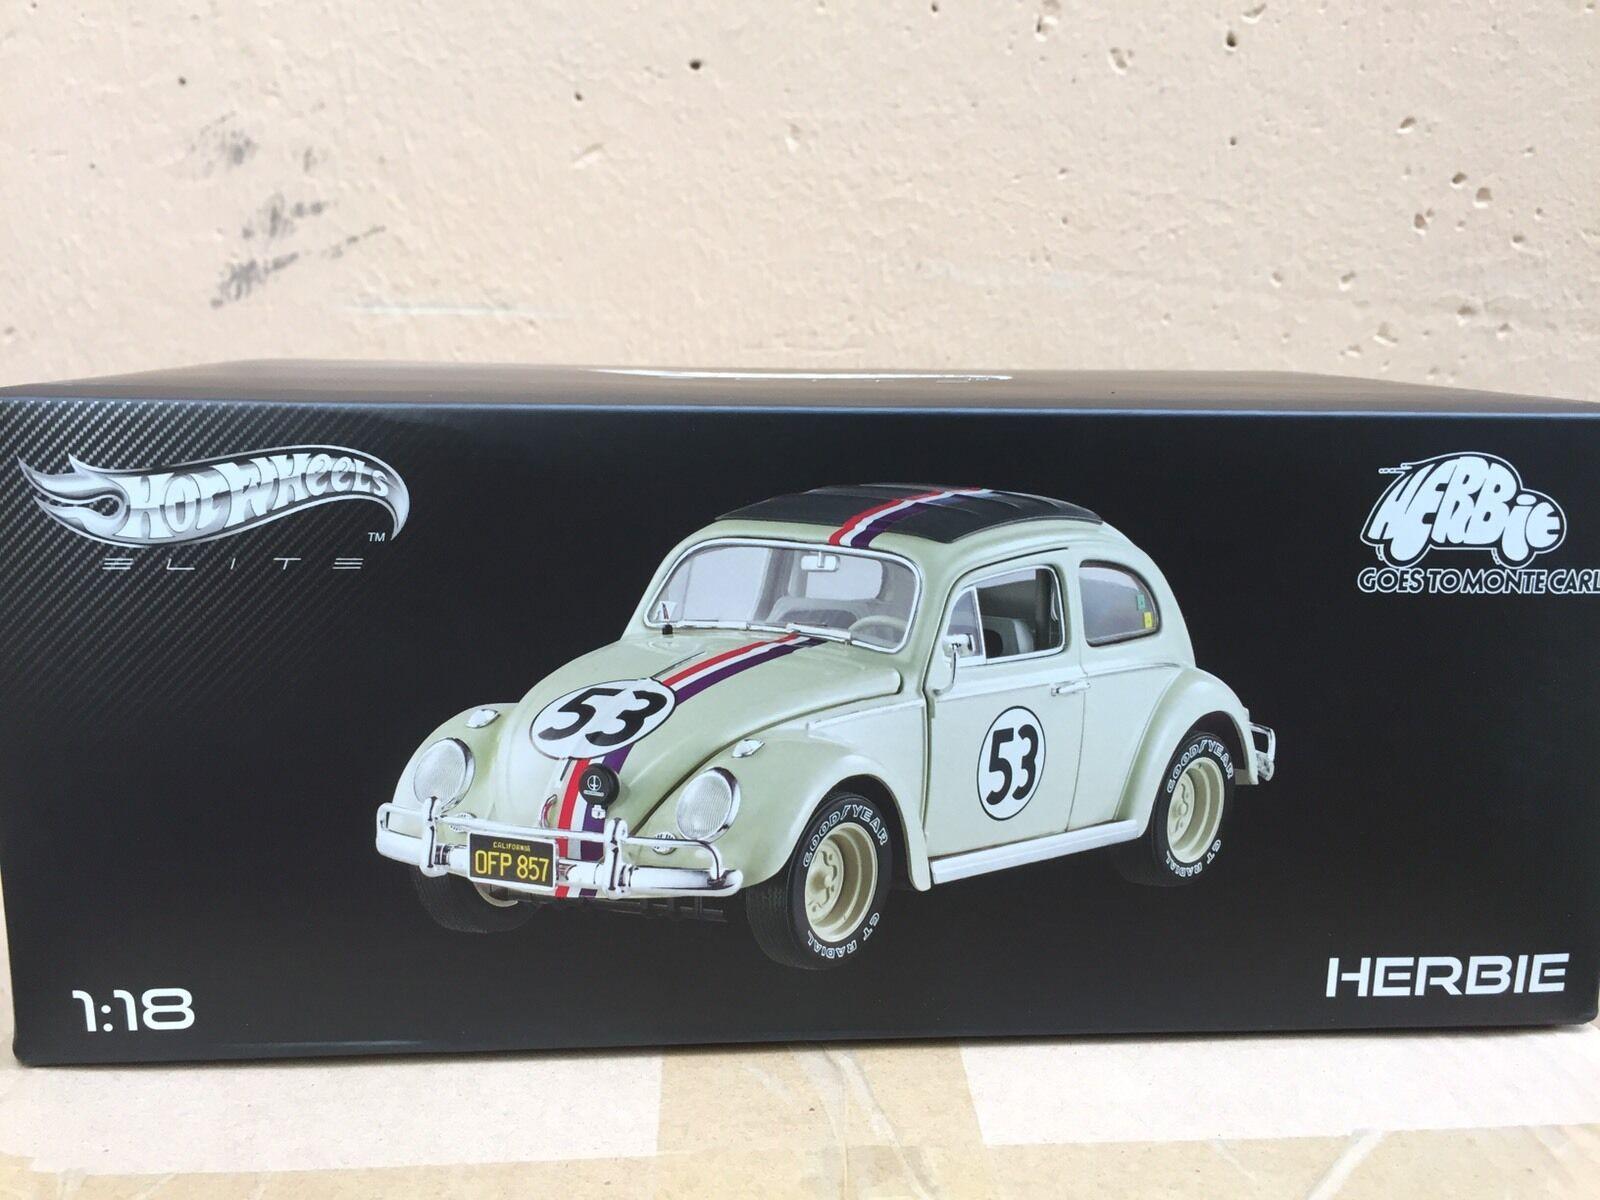 Volkswagen Herbie Monte Carlo Movie Hotwheels Elite 1 18  BLY22